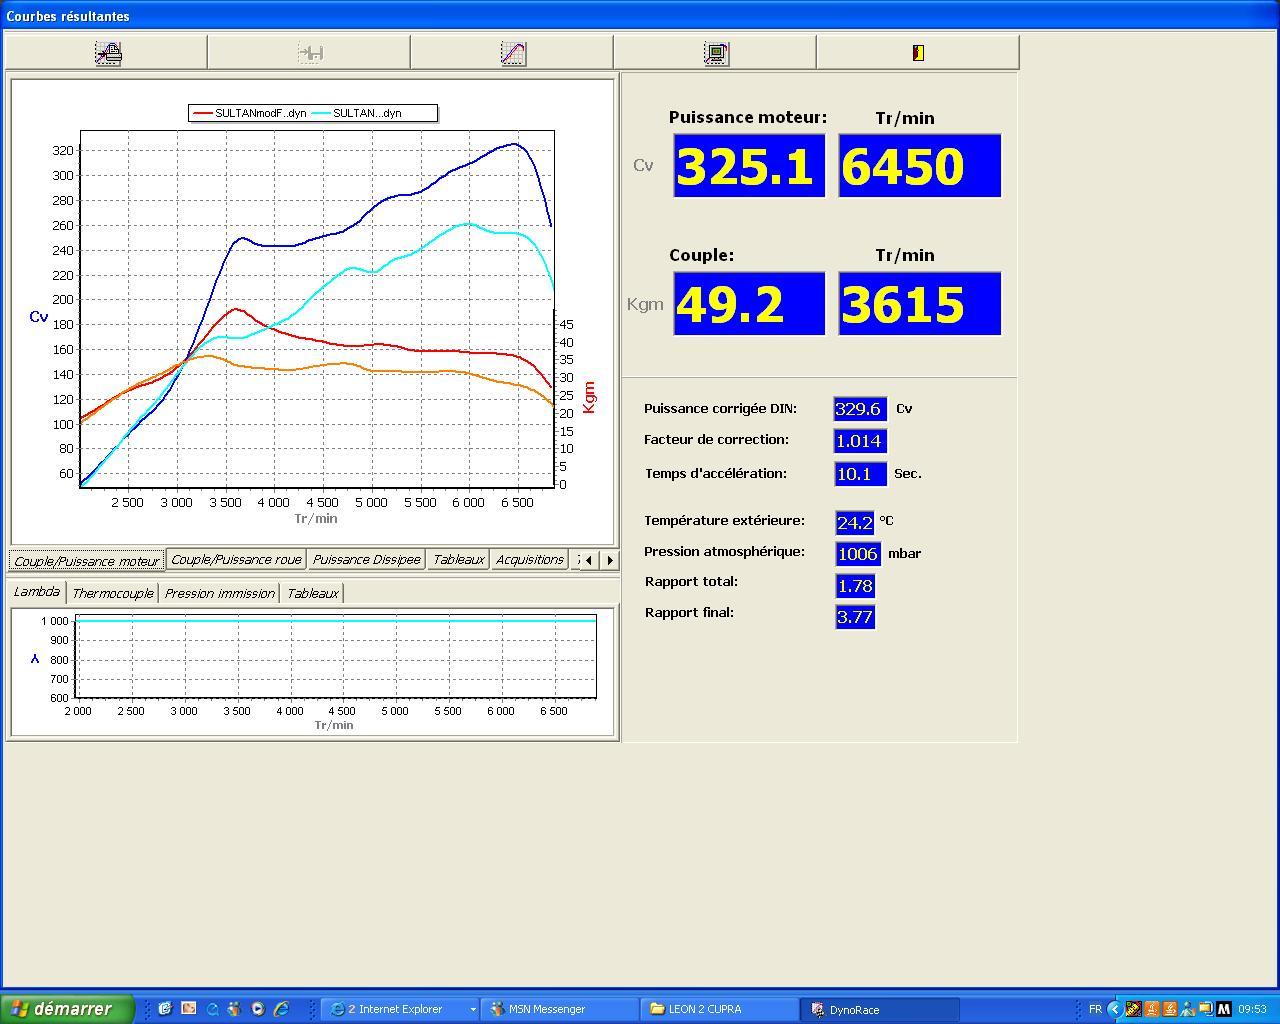 leon 2 cupra 330cv  49 mk - diapason motorsport -